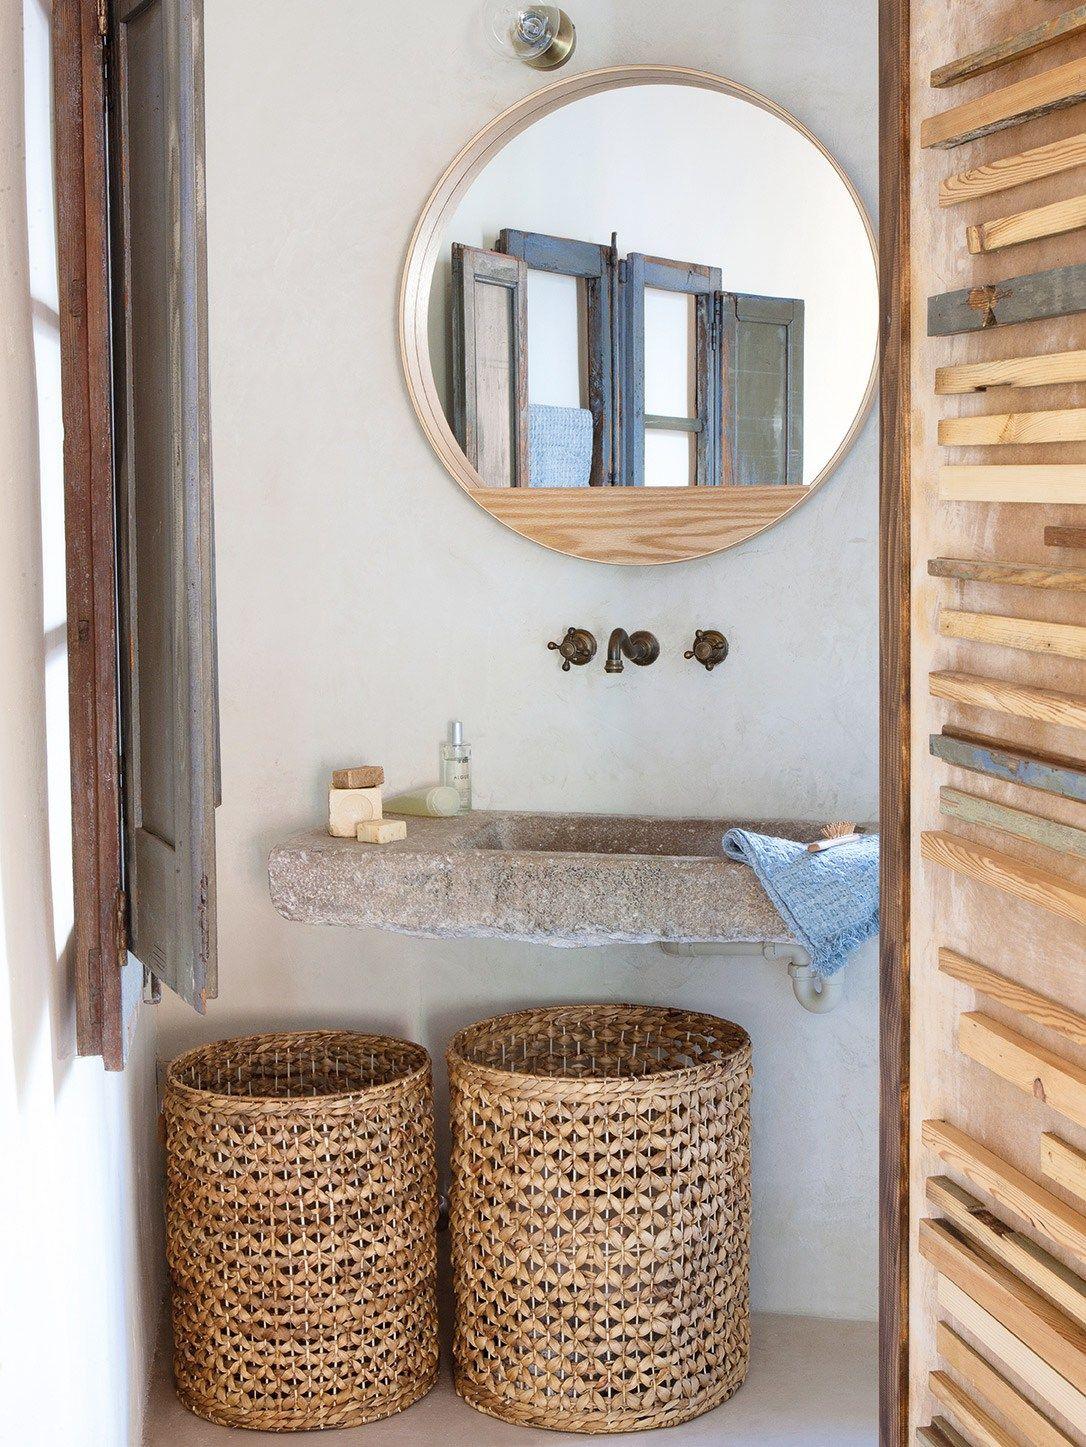 Simply Beautiful Bathrooms: Boasting A Raw, Natural And